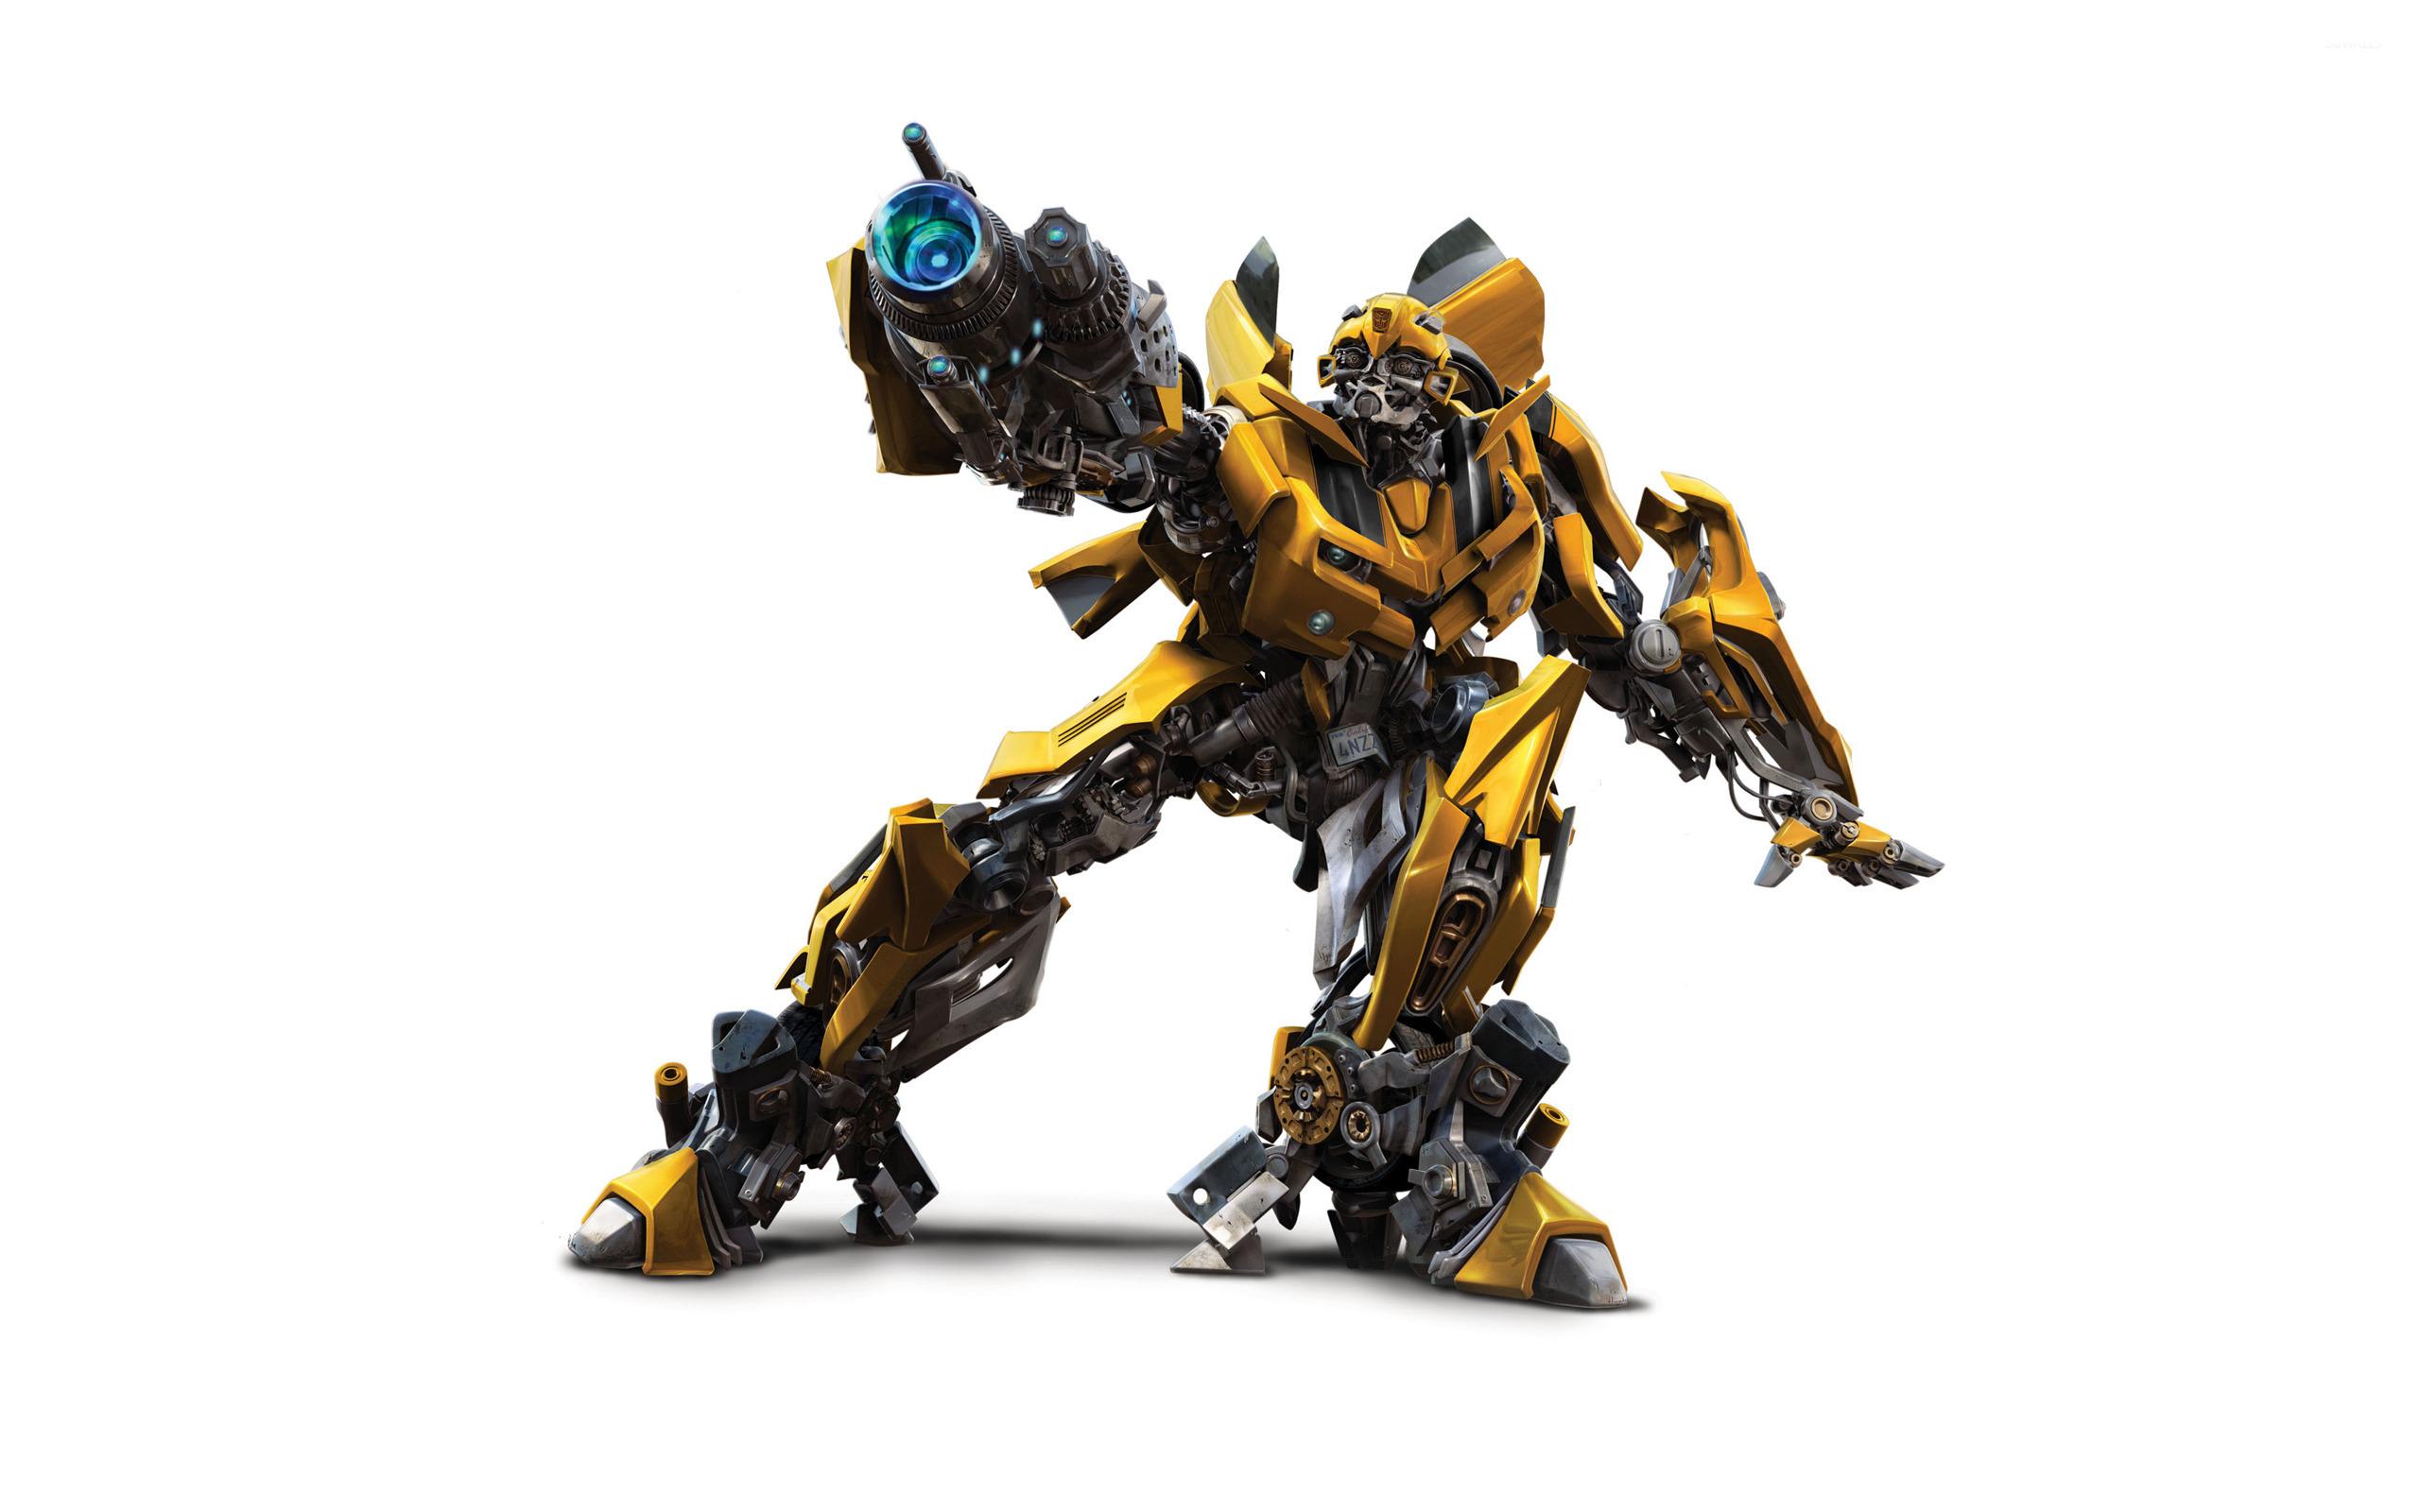 Bumblebee   Transformers wallpaper   Movie wallpapers   18355 1680x1050